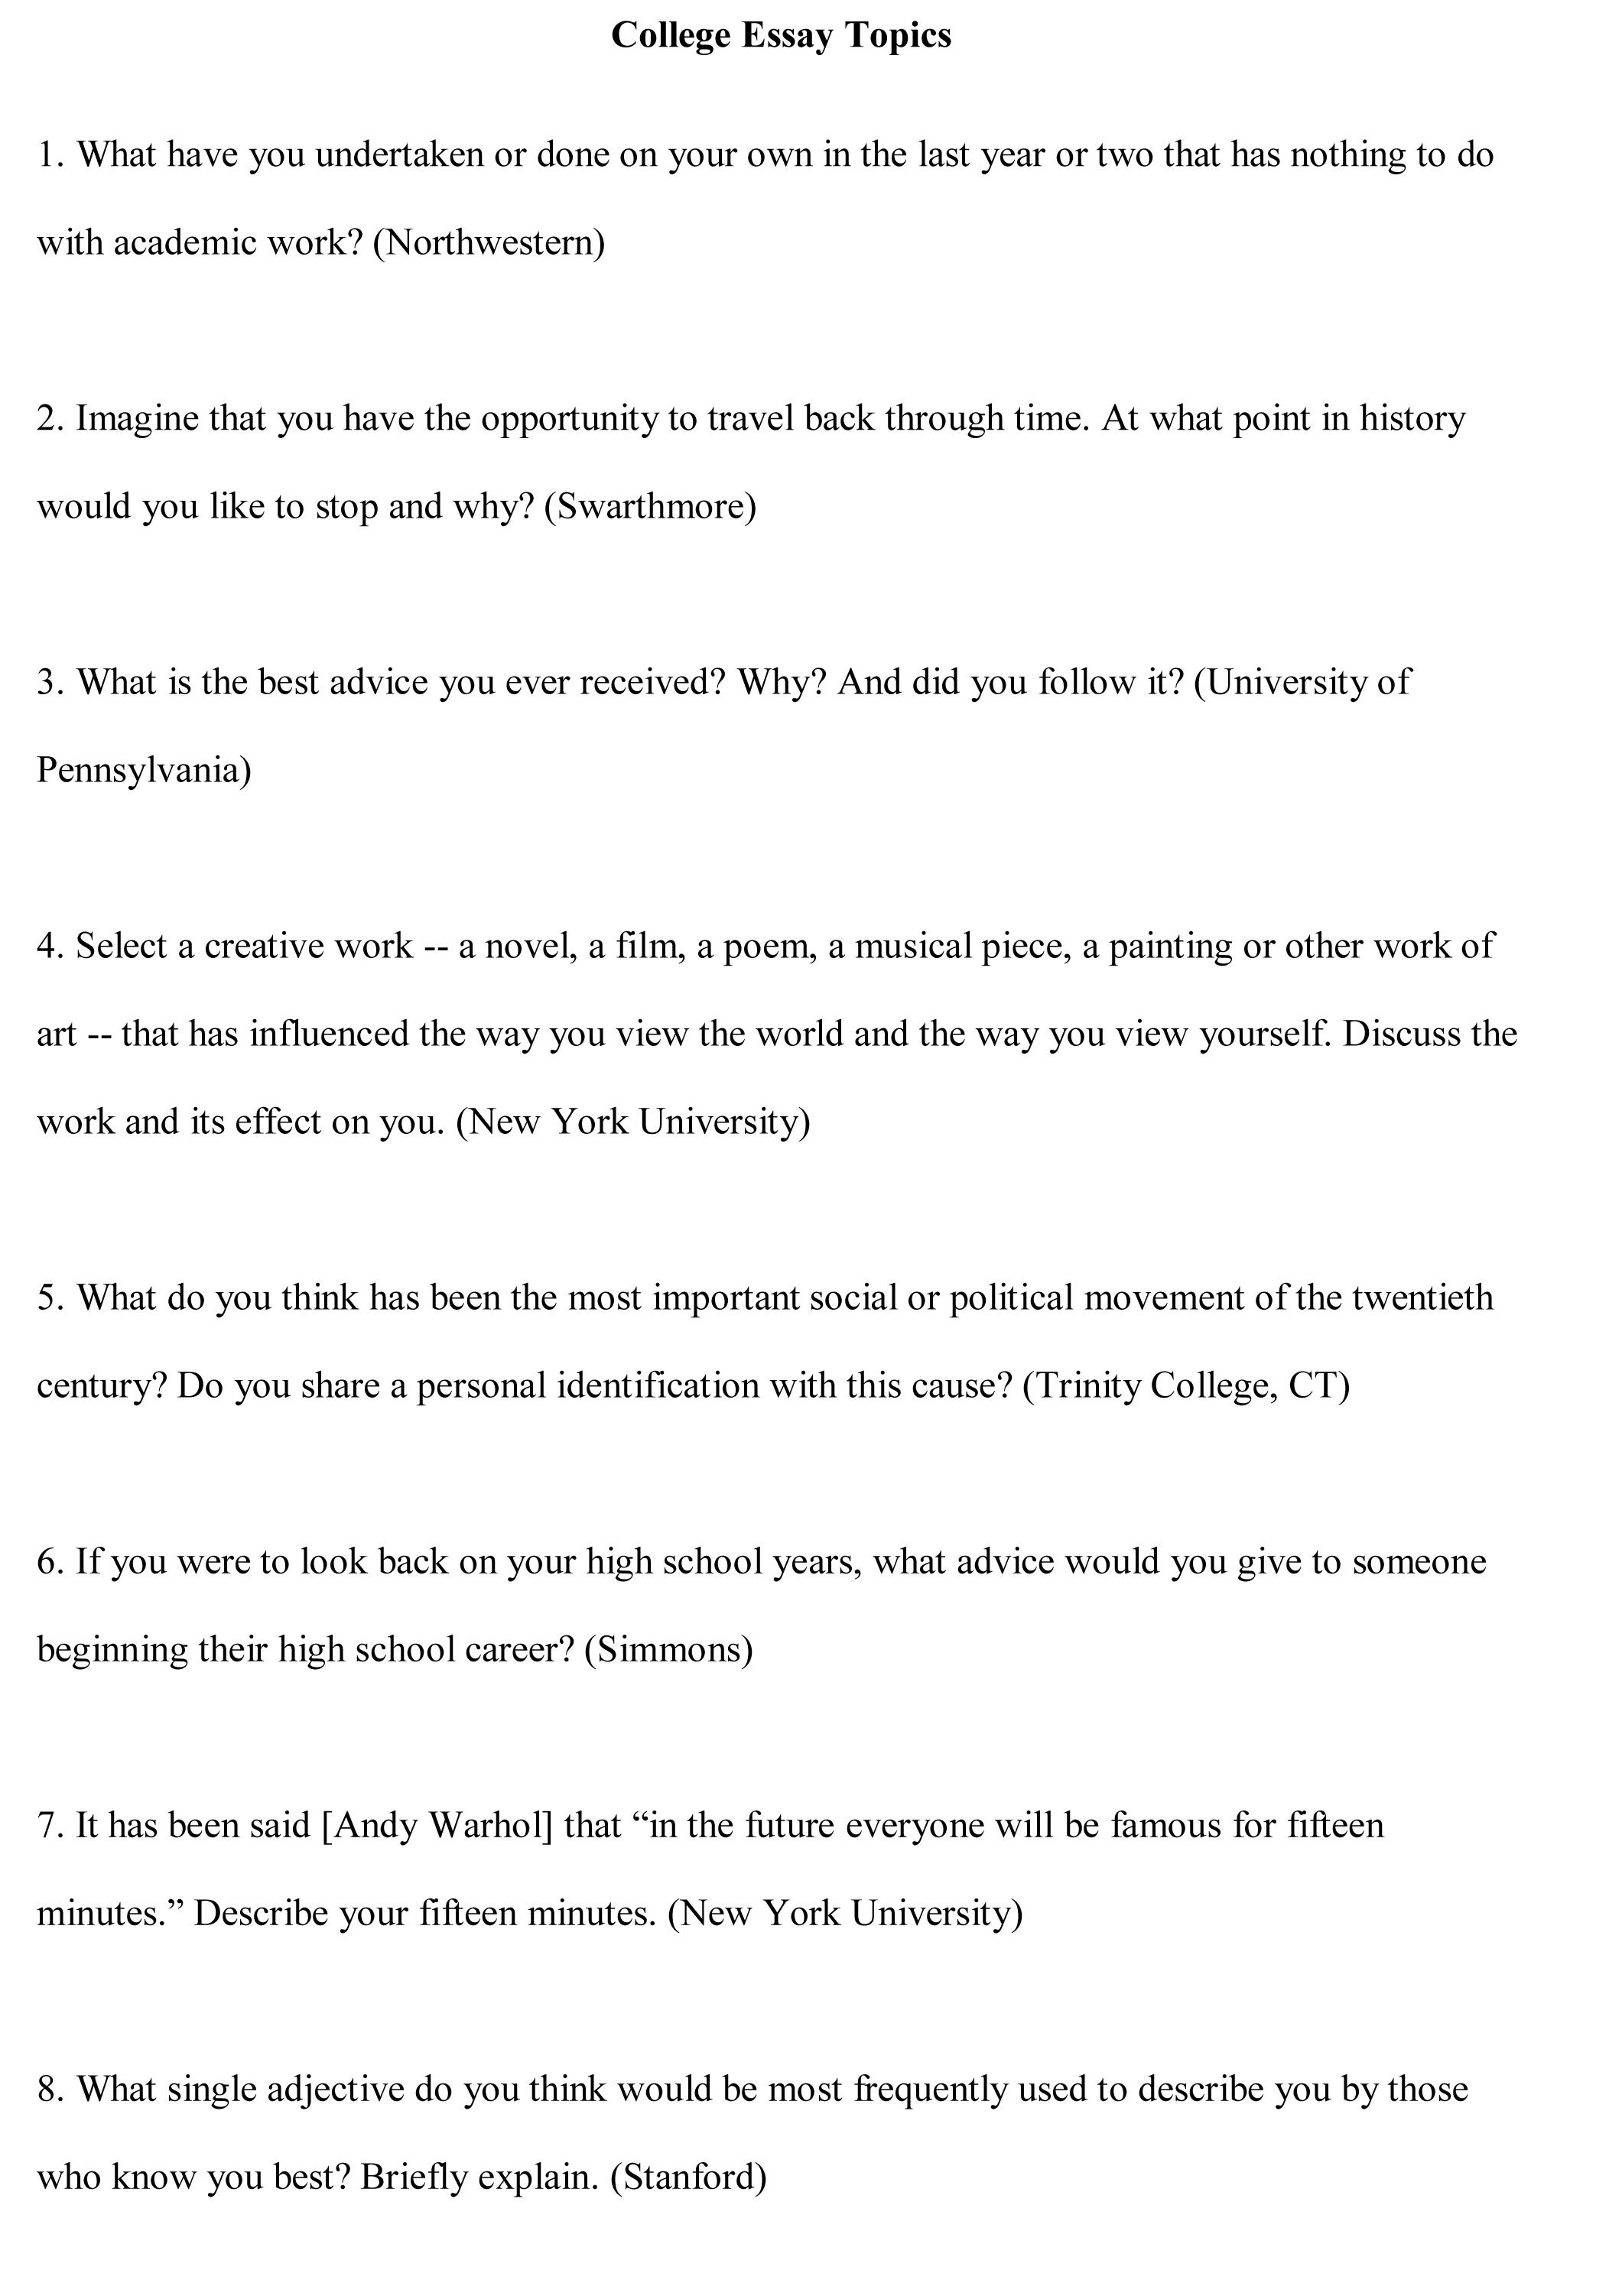 016 College Essay Topics Free Sample Example Argumentative Rare Prompts For 7th Graders High School Pdf Full